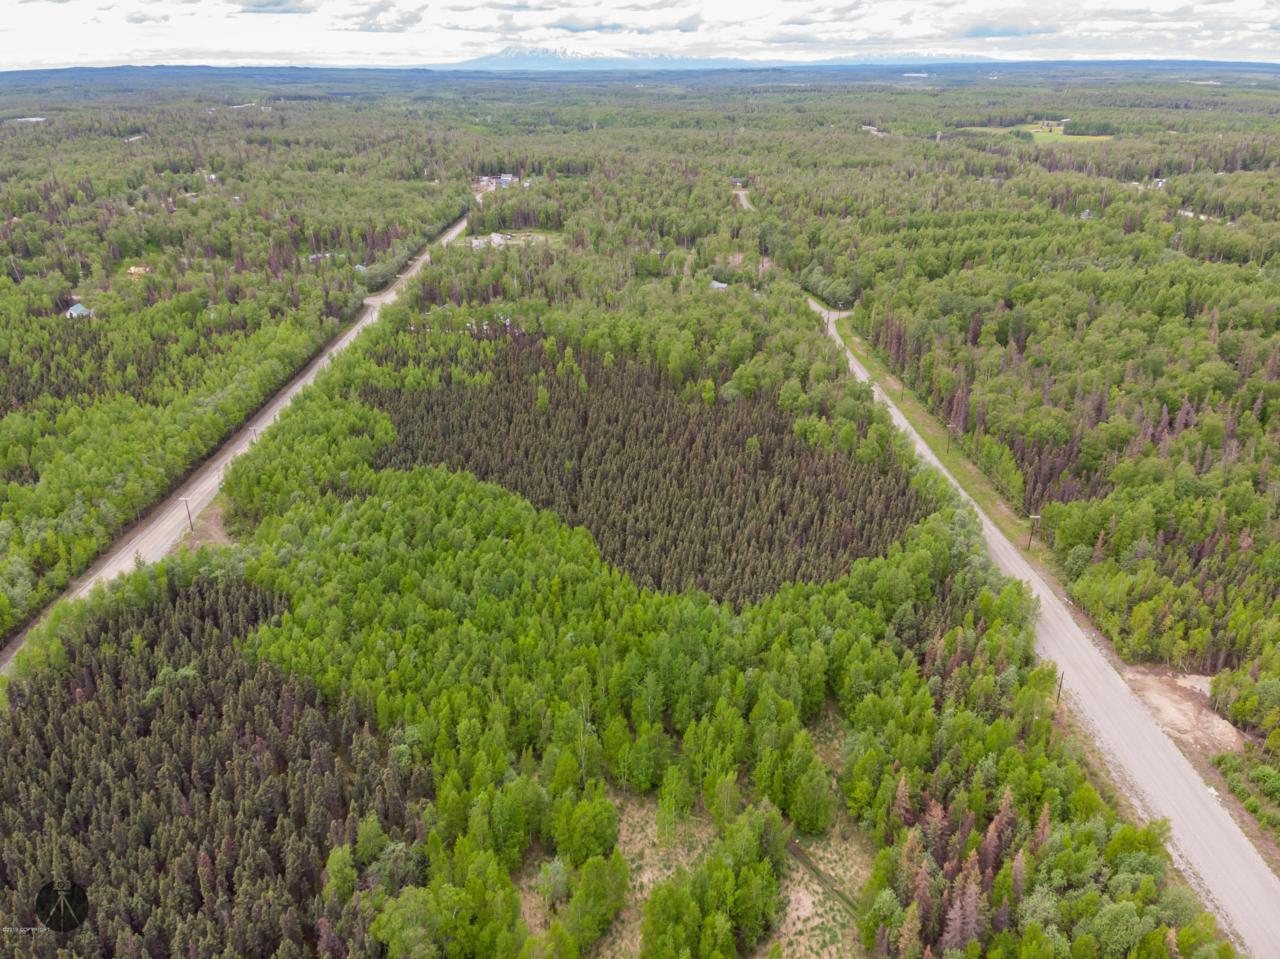 https://bt-photos.global.ssl.fastly.net/alaska/1280_boomver_1_19-7753-2.jpg